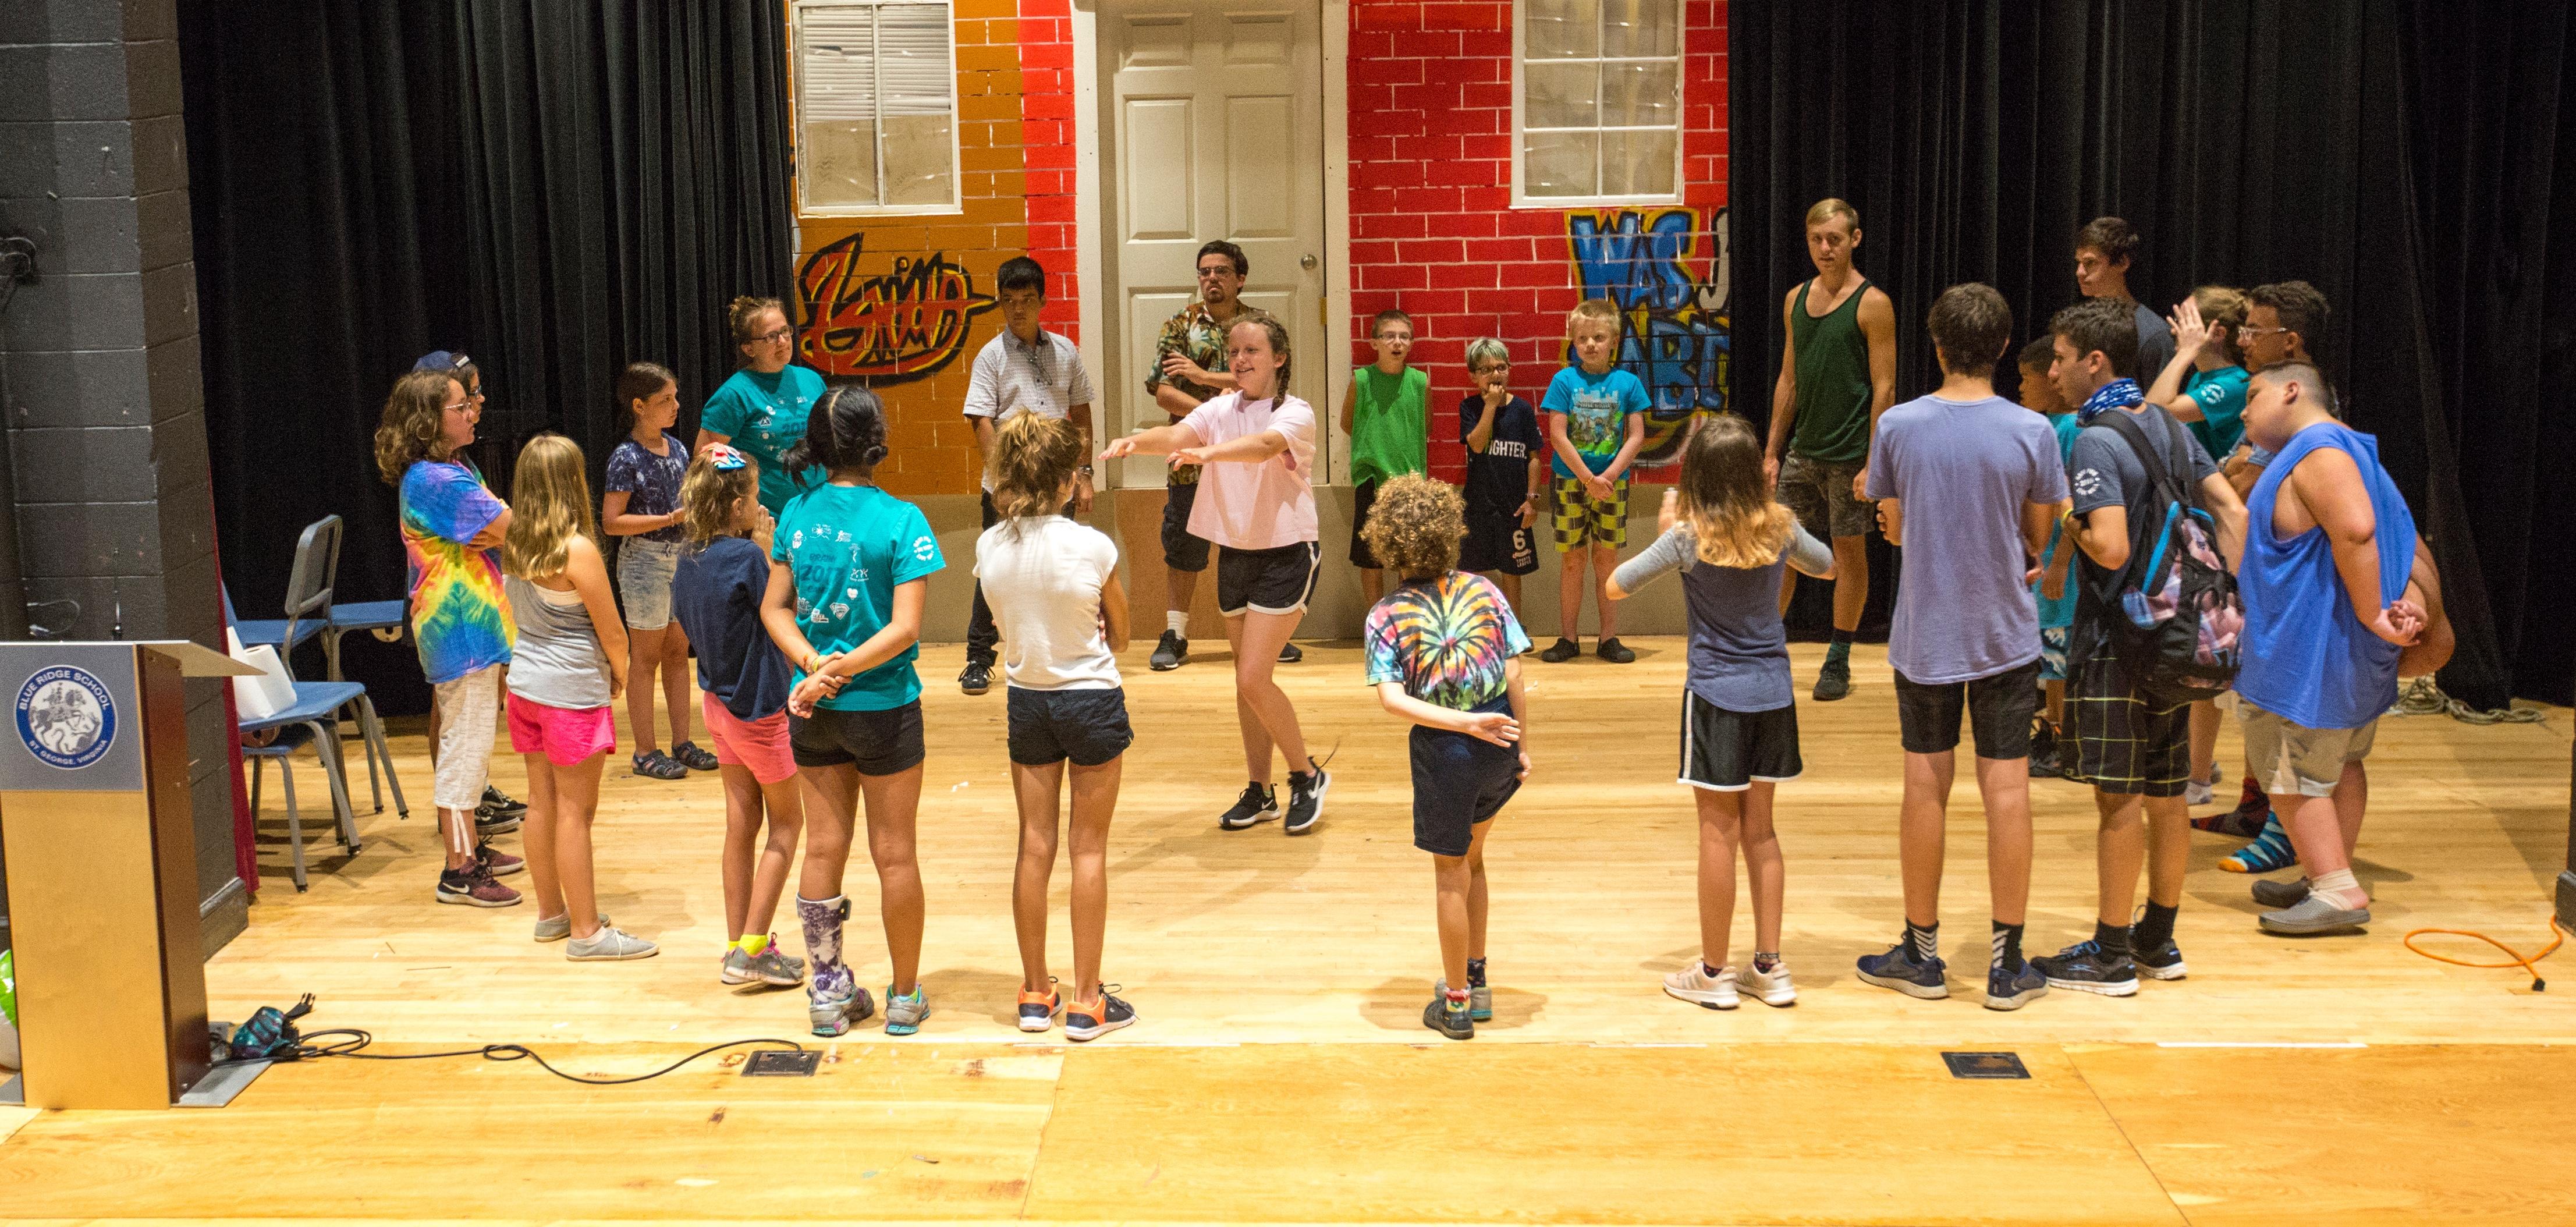 Children participate in theater.